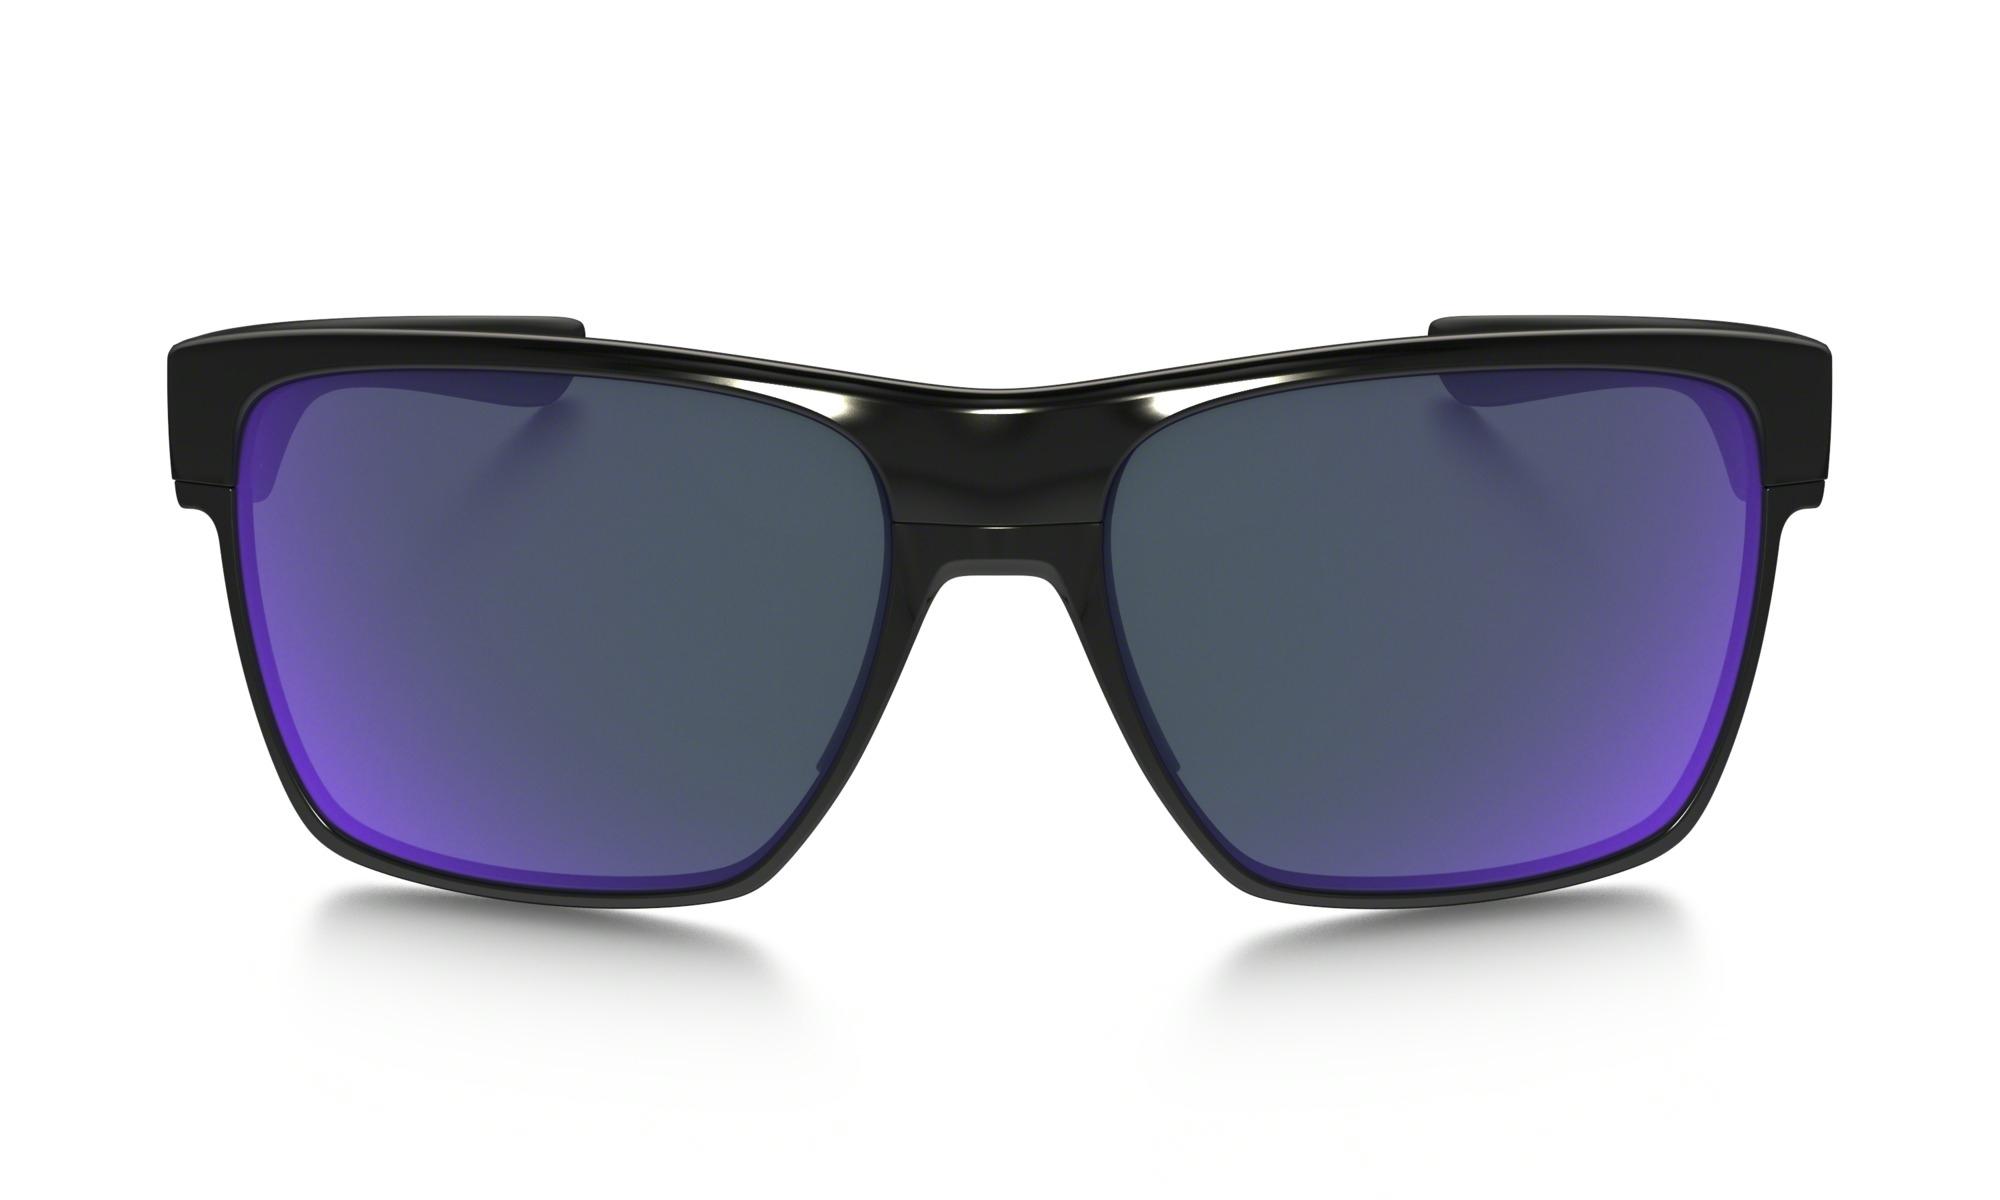 De Soleil Two Oakley Face Black Iridium Xl Pol Violet Lunettes v0wOmN8n